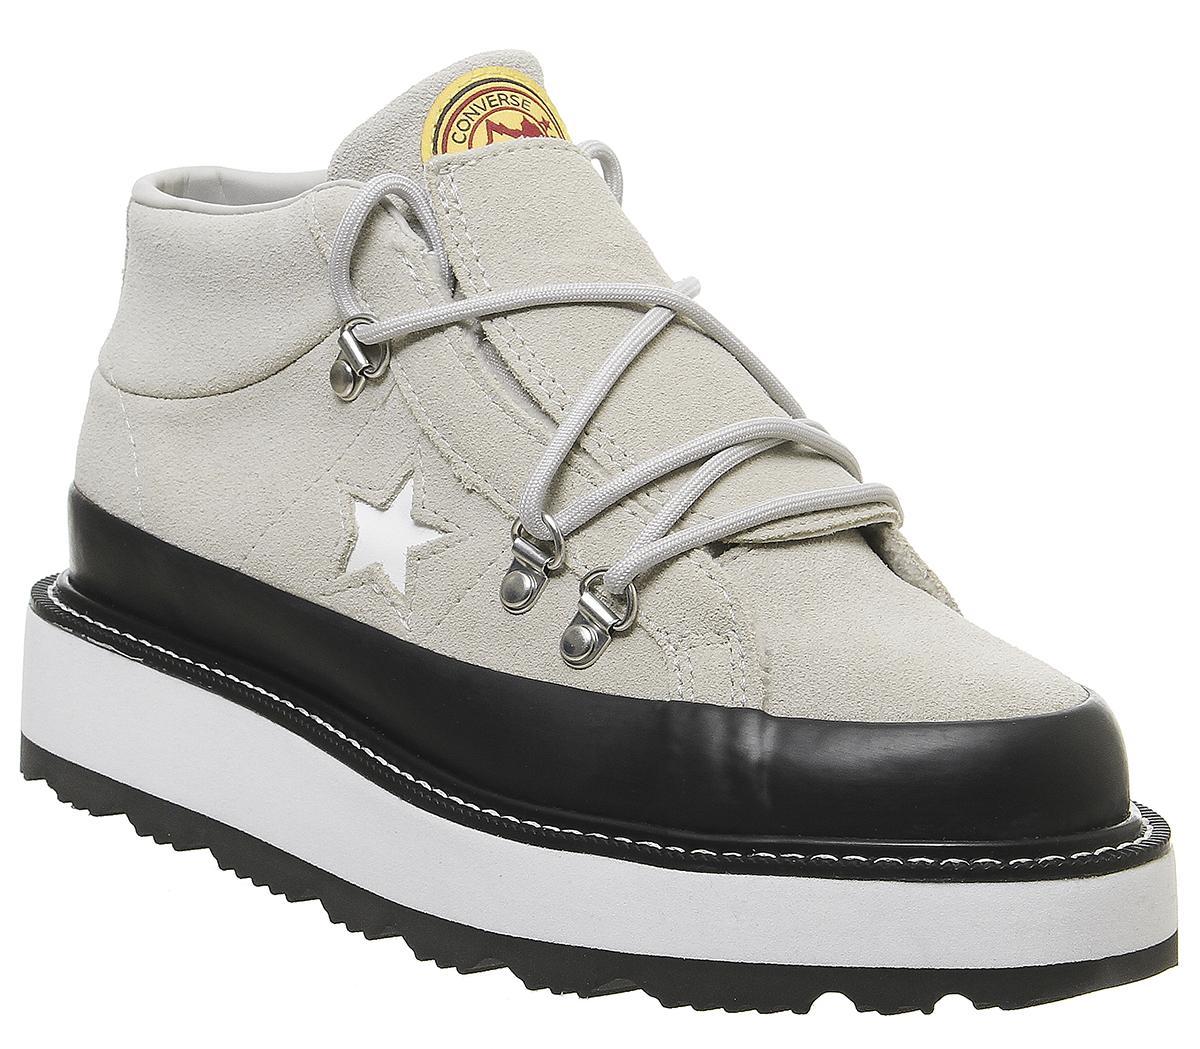 converse one star boots Online Shopping for Women, Men, Kids ...